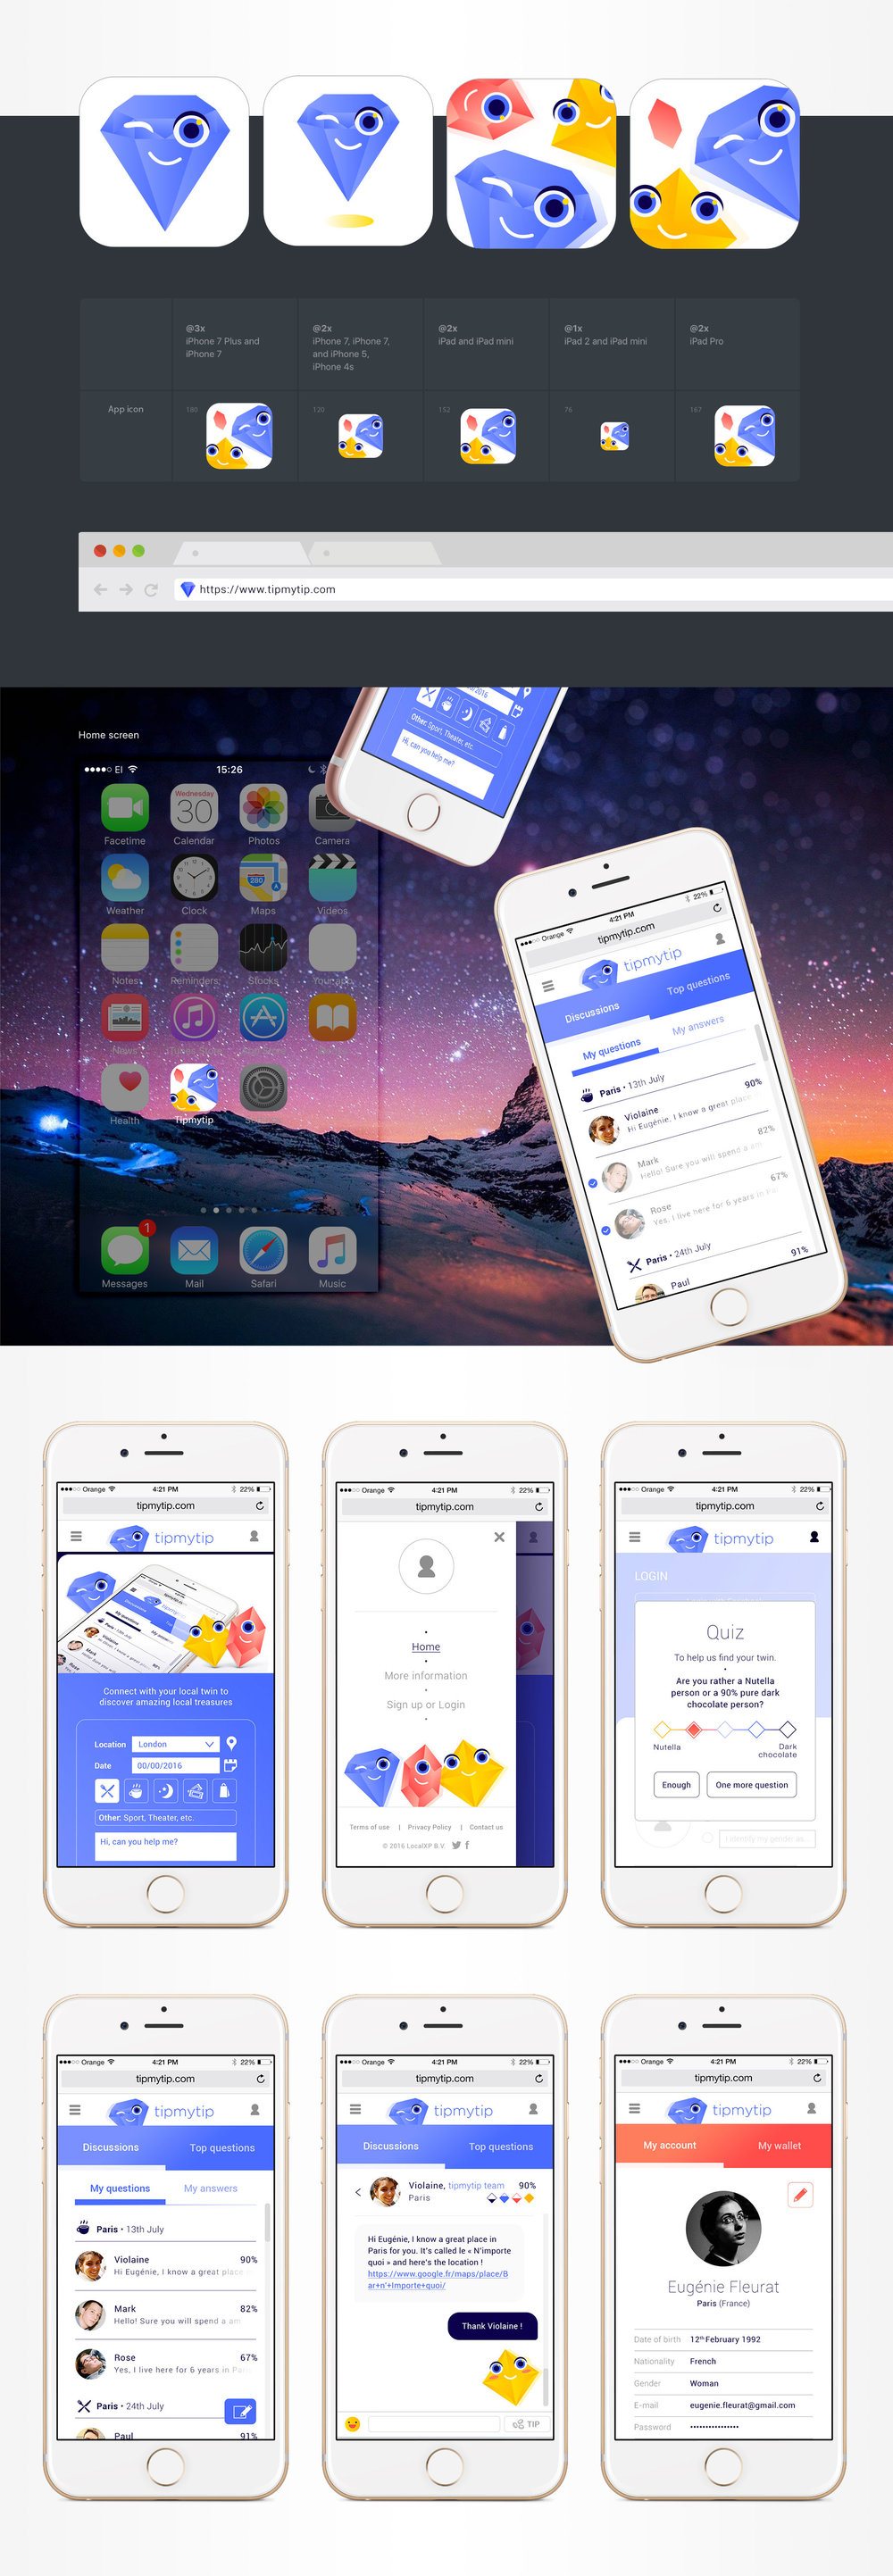 WORK-refonte-mobile-tipmytip.jpg